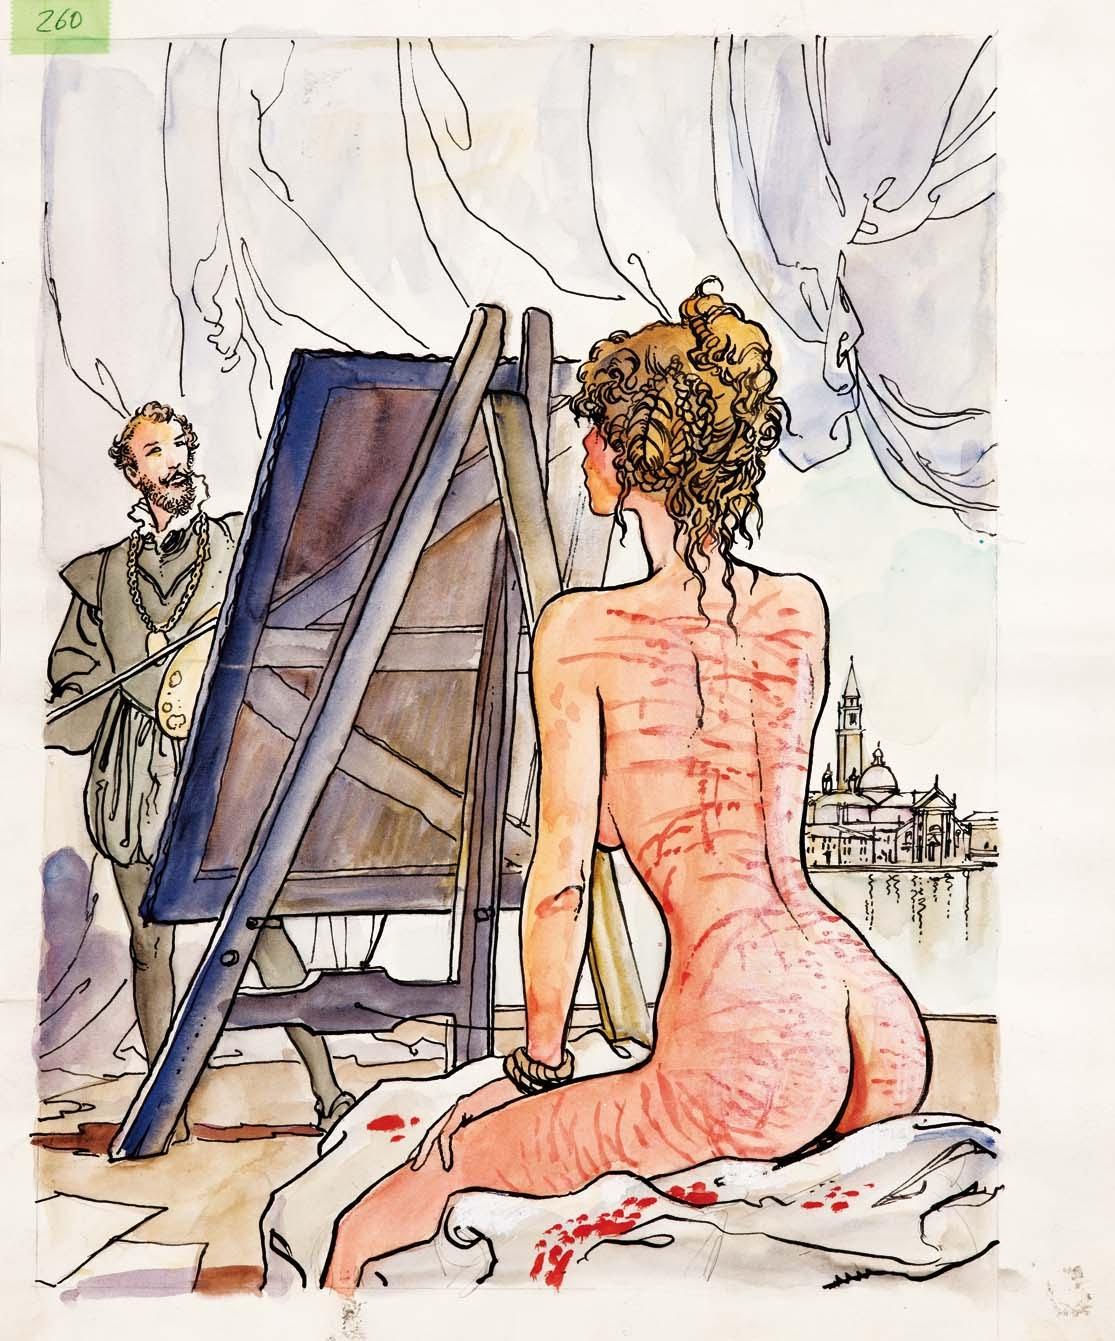 Bitches suckin pornagraphic illustrated erotic stories